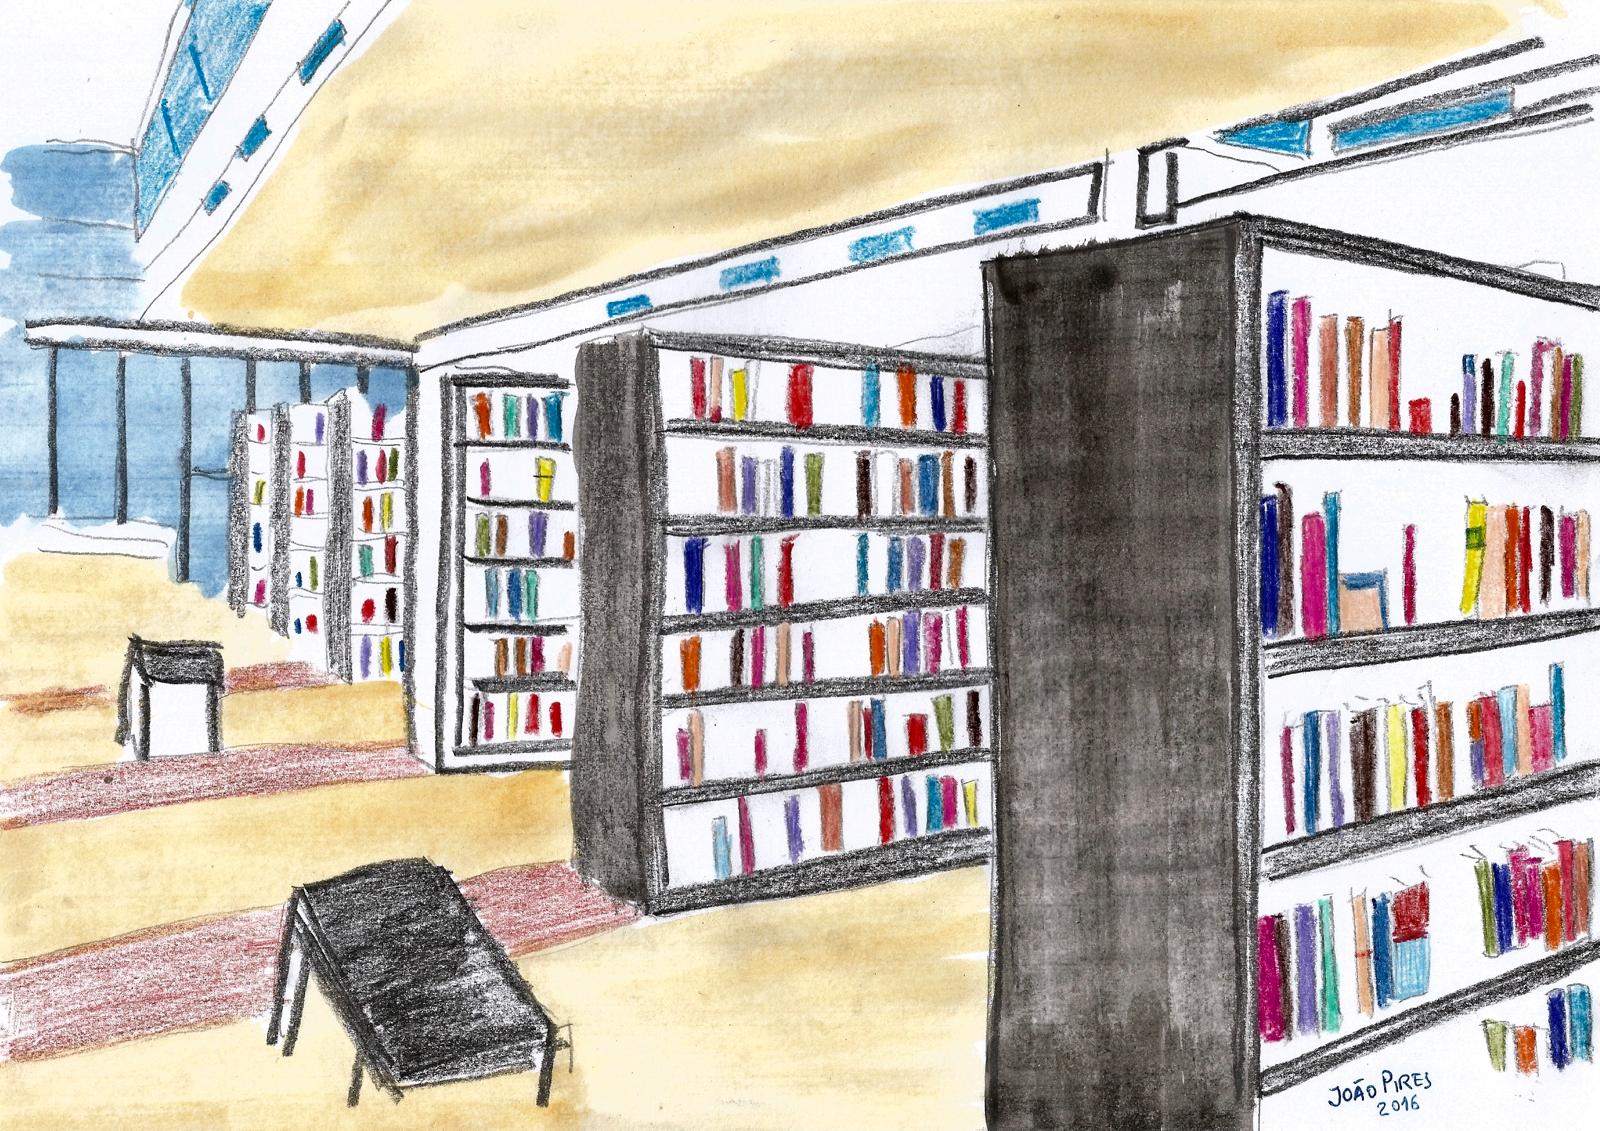 2016-library-biblioteca-sketch-desenho-aguarela-watercolor_Joao-Pires.jpg